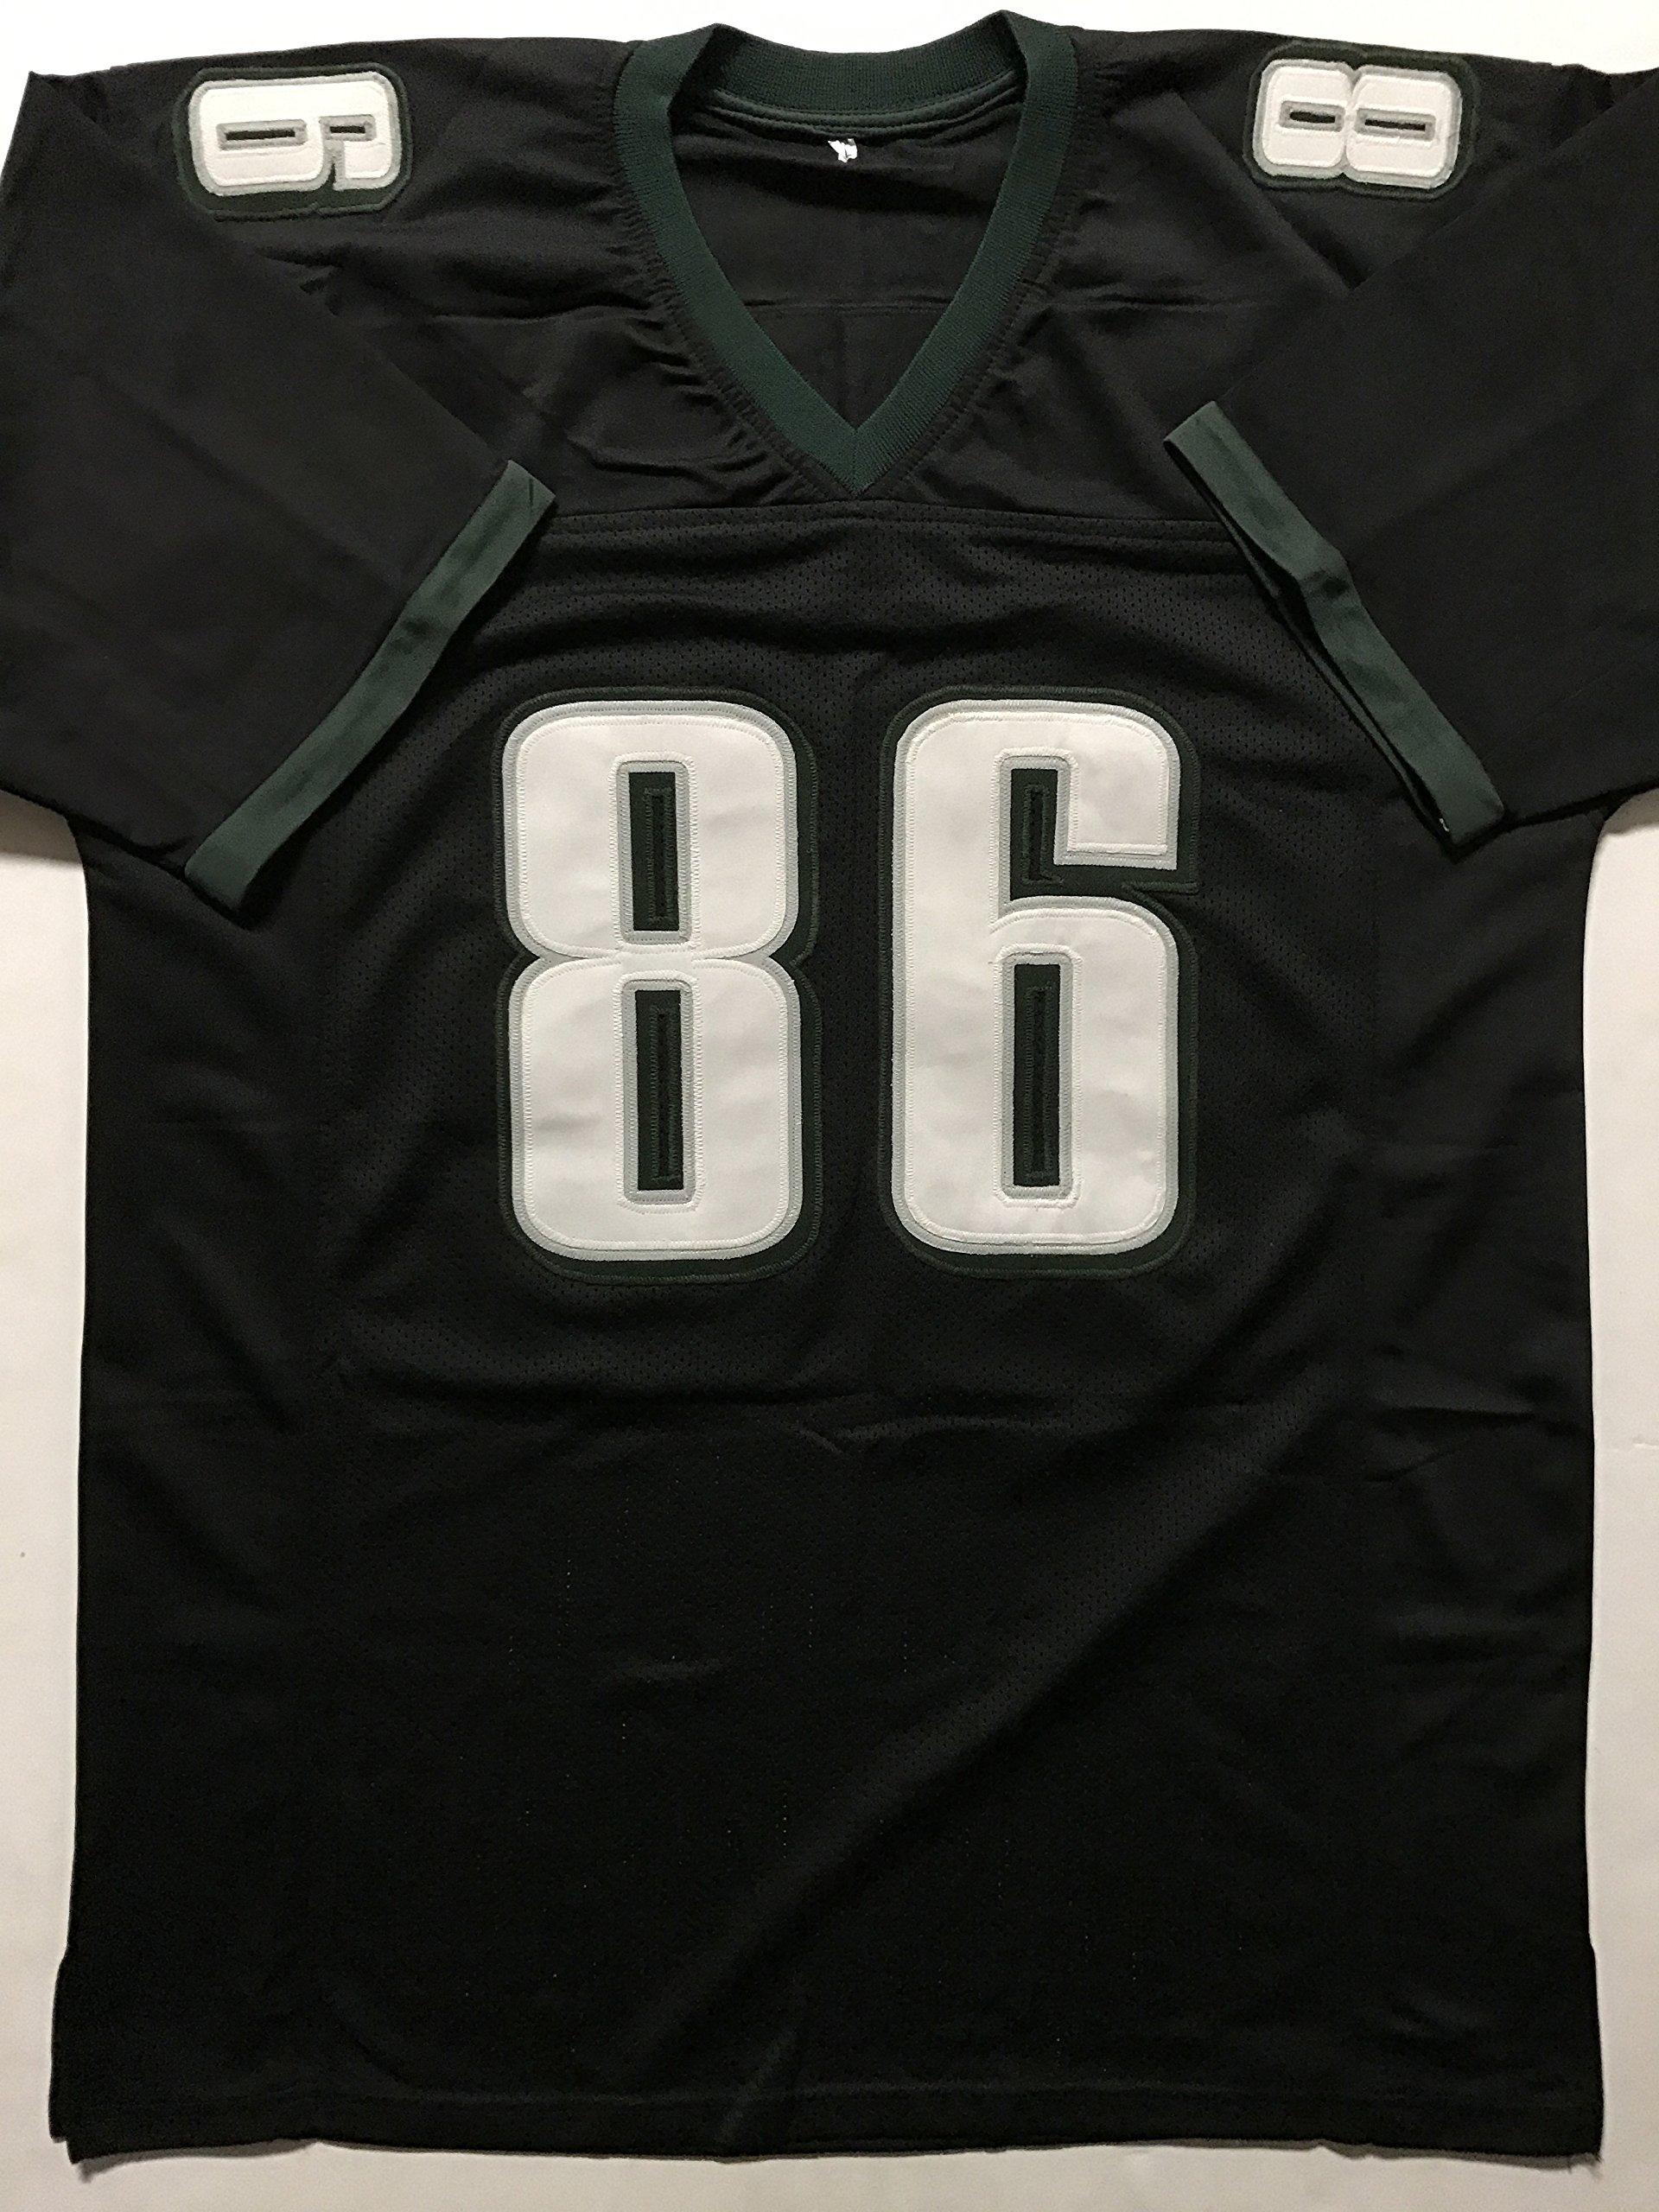 Autographed/Signed Zach Ertz Philadelphia Black Football Jersey JSA COA